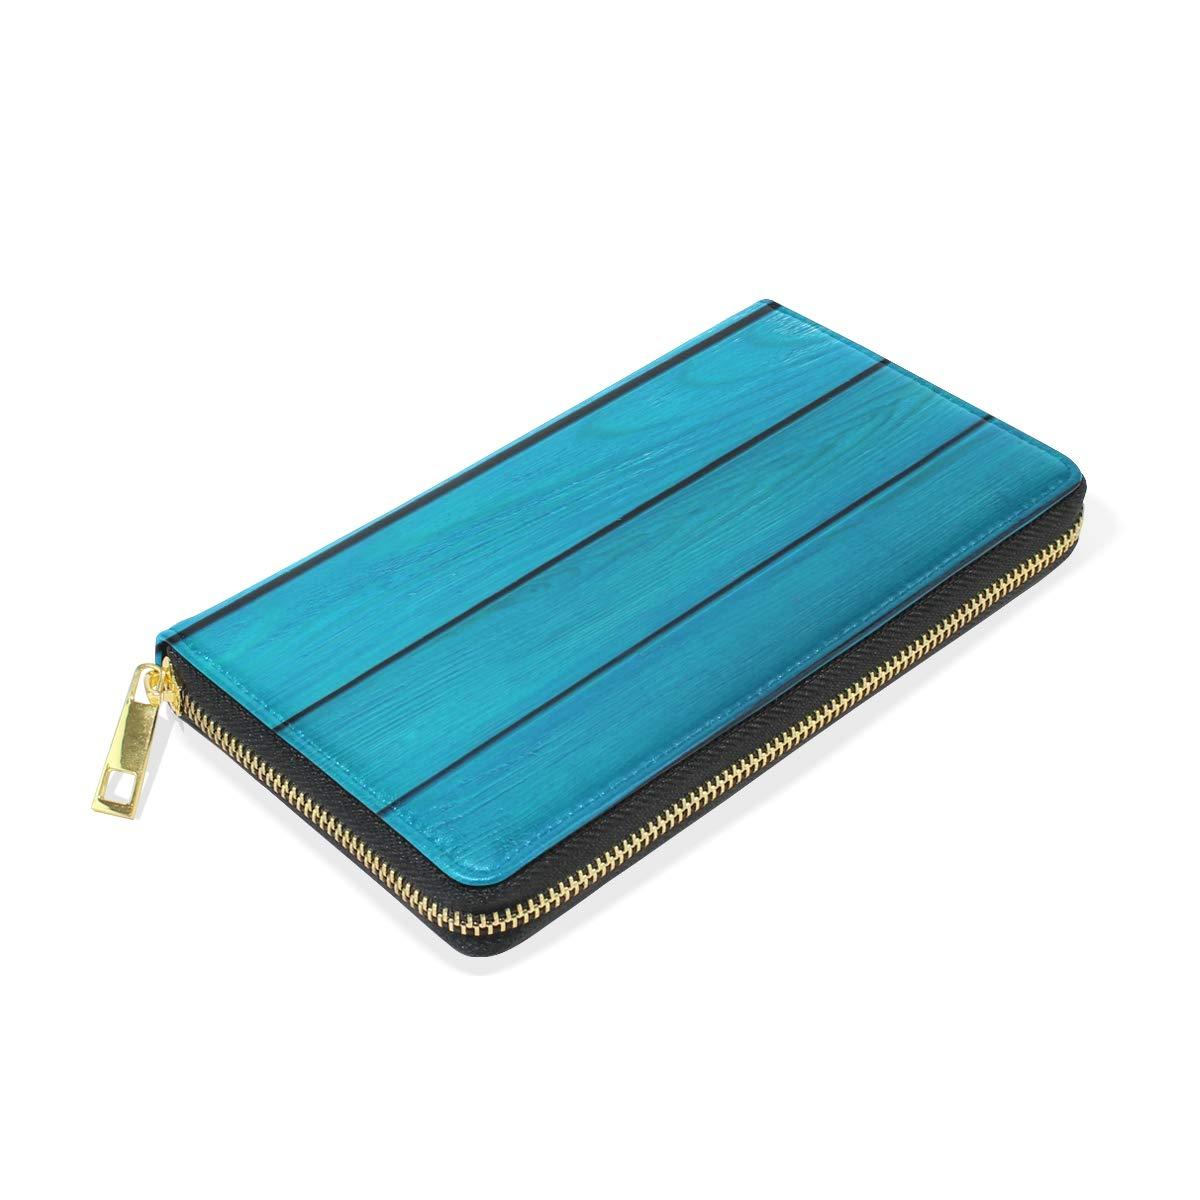 Blue Women Wallet Female Coin Purse Phone Clutch Pouch Girl Cash Bag Leather Card Change Holder Organizer Storage Key Hold Elegant Handbag For Party Birthday Gift